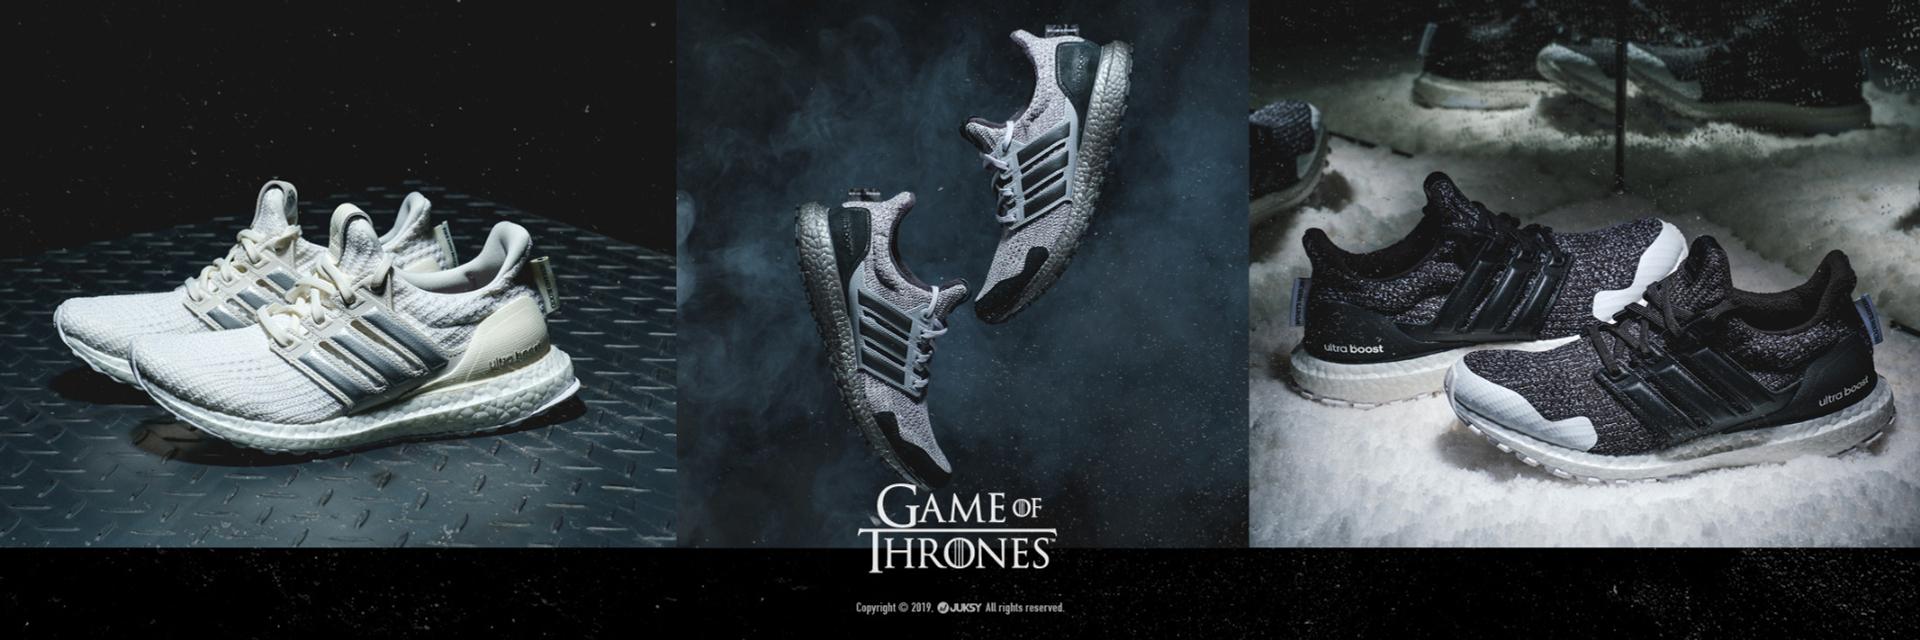 【Game of Thrones 狂潮席捲全台】 究竟最後誰能上鐵王座?搶先透過 adidas Ultraboost 最狂聯名一探究竟!